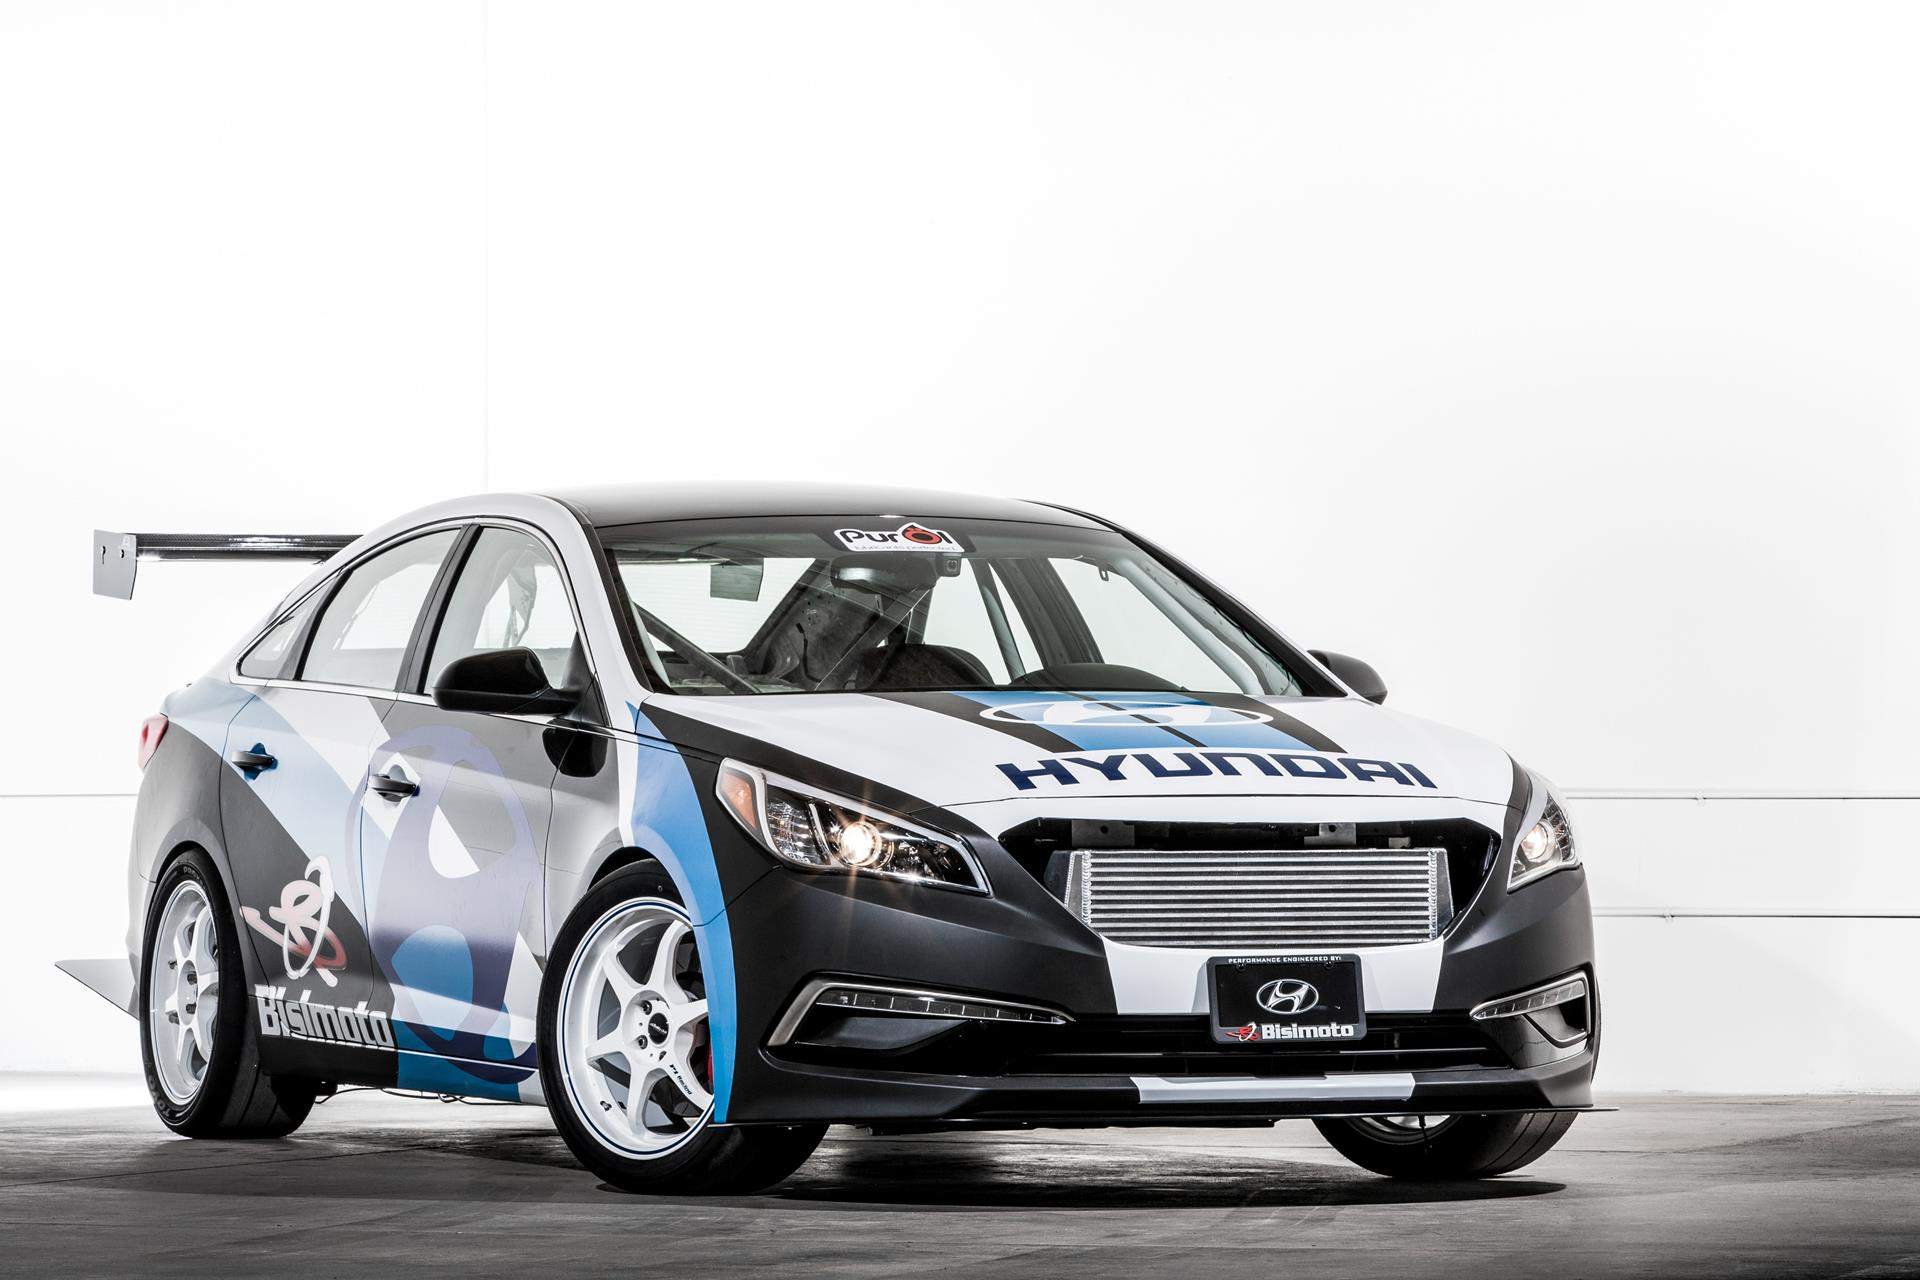 Hyundai Bisimoto Engineering Sonata pictures and wallpaper